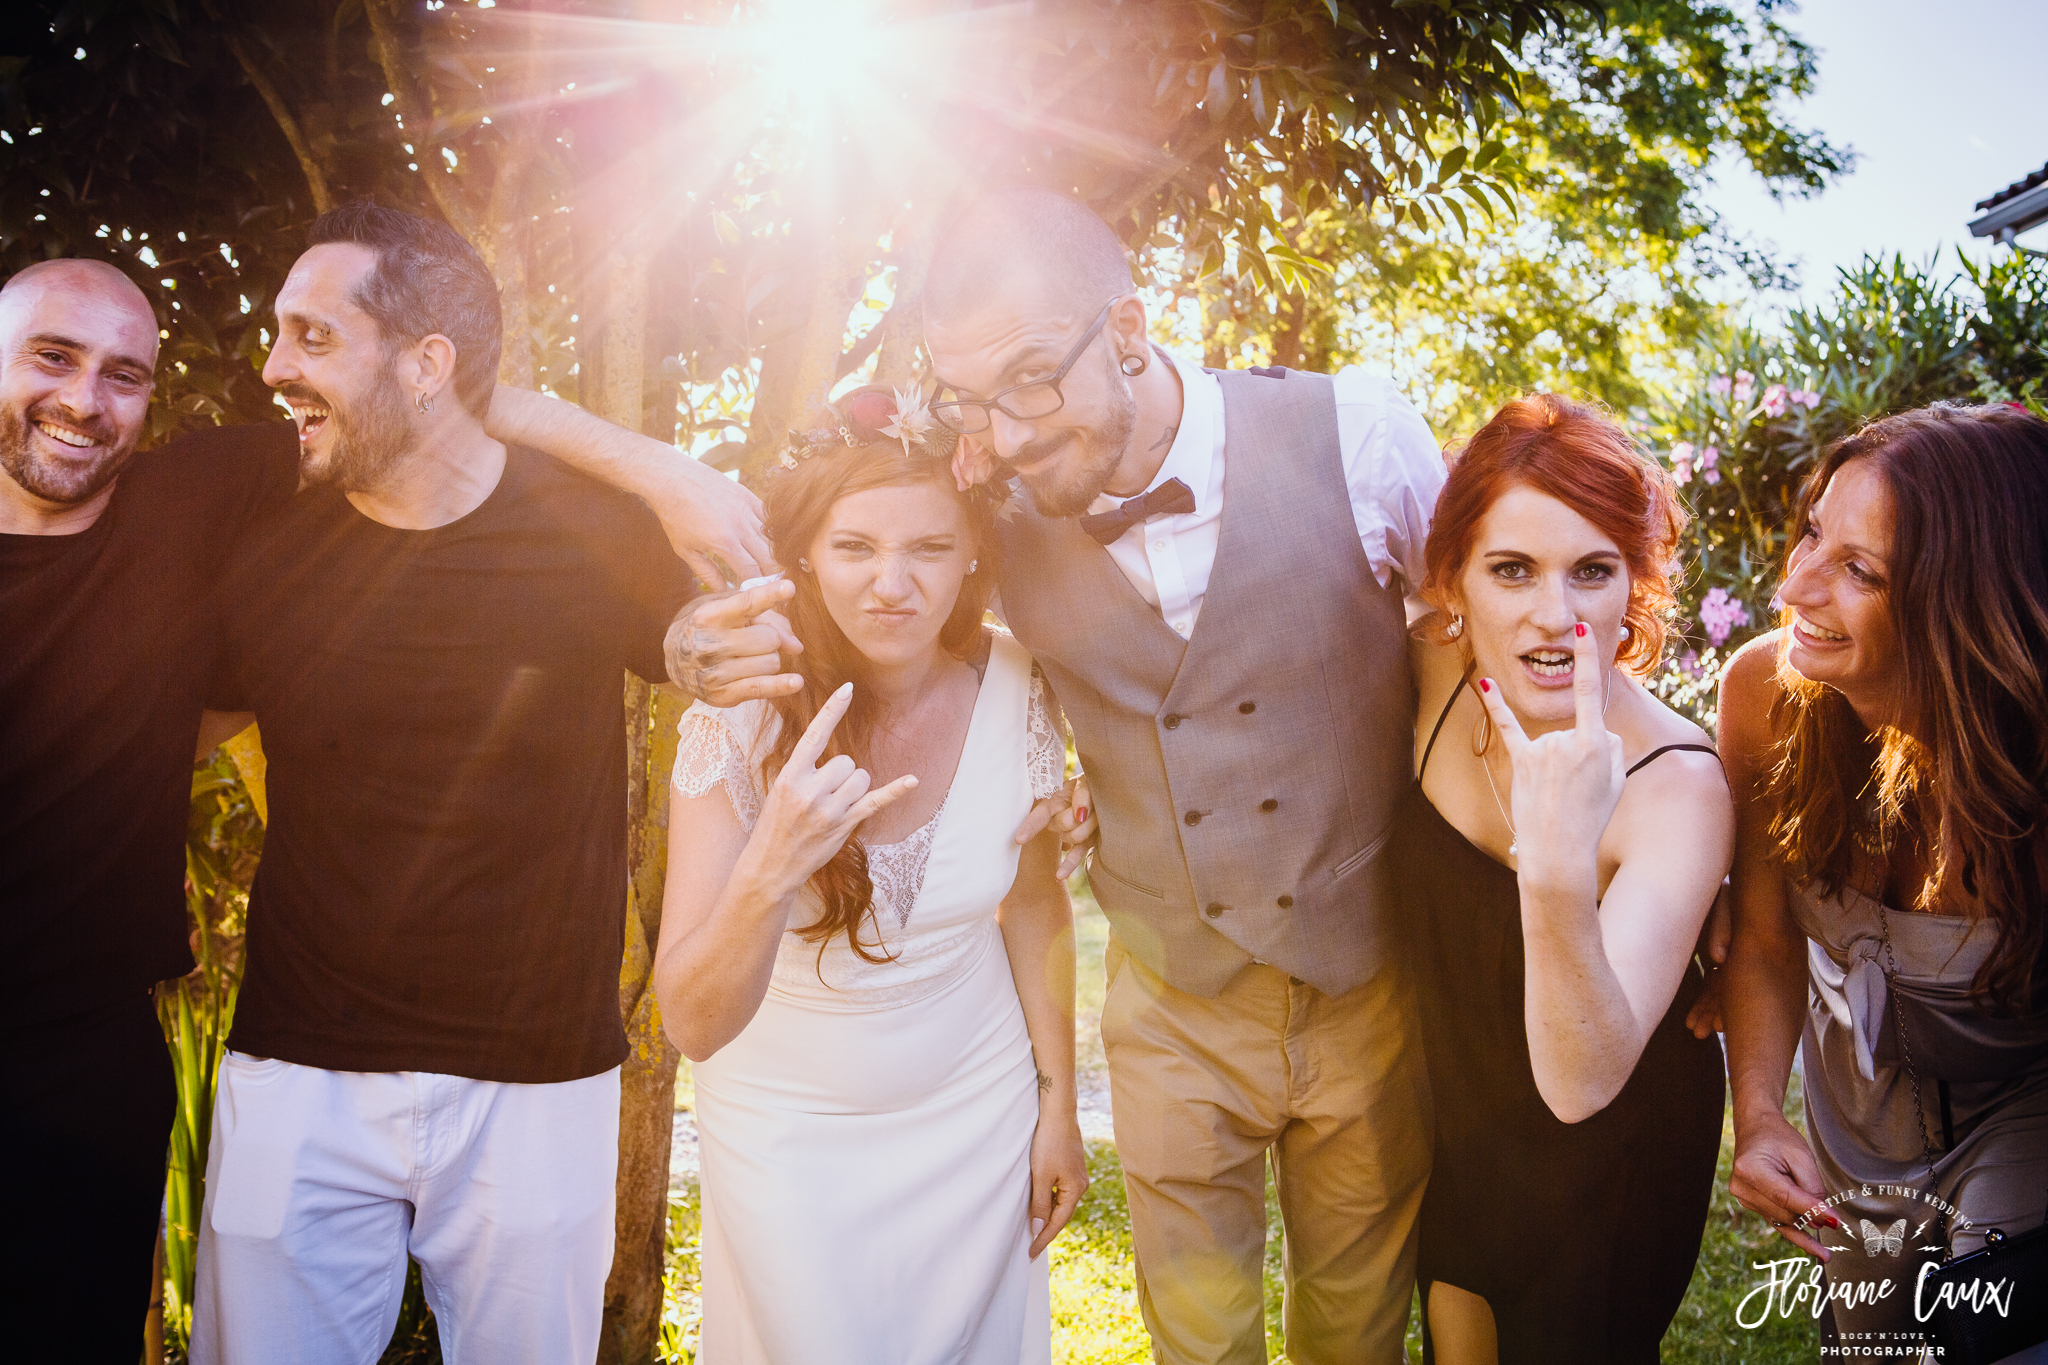 photographe-mariage-toulouse-rocknroll-maries-tatoues-floriane-caux-104